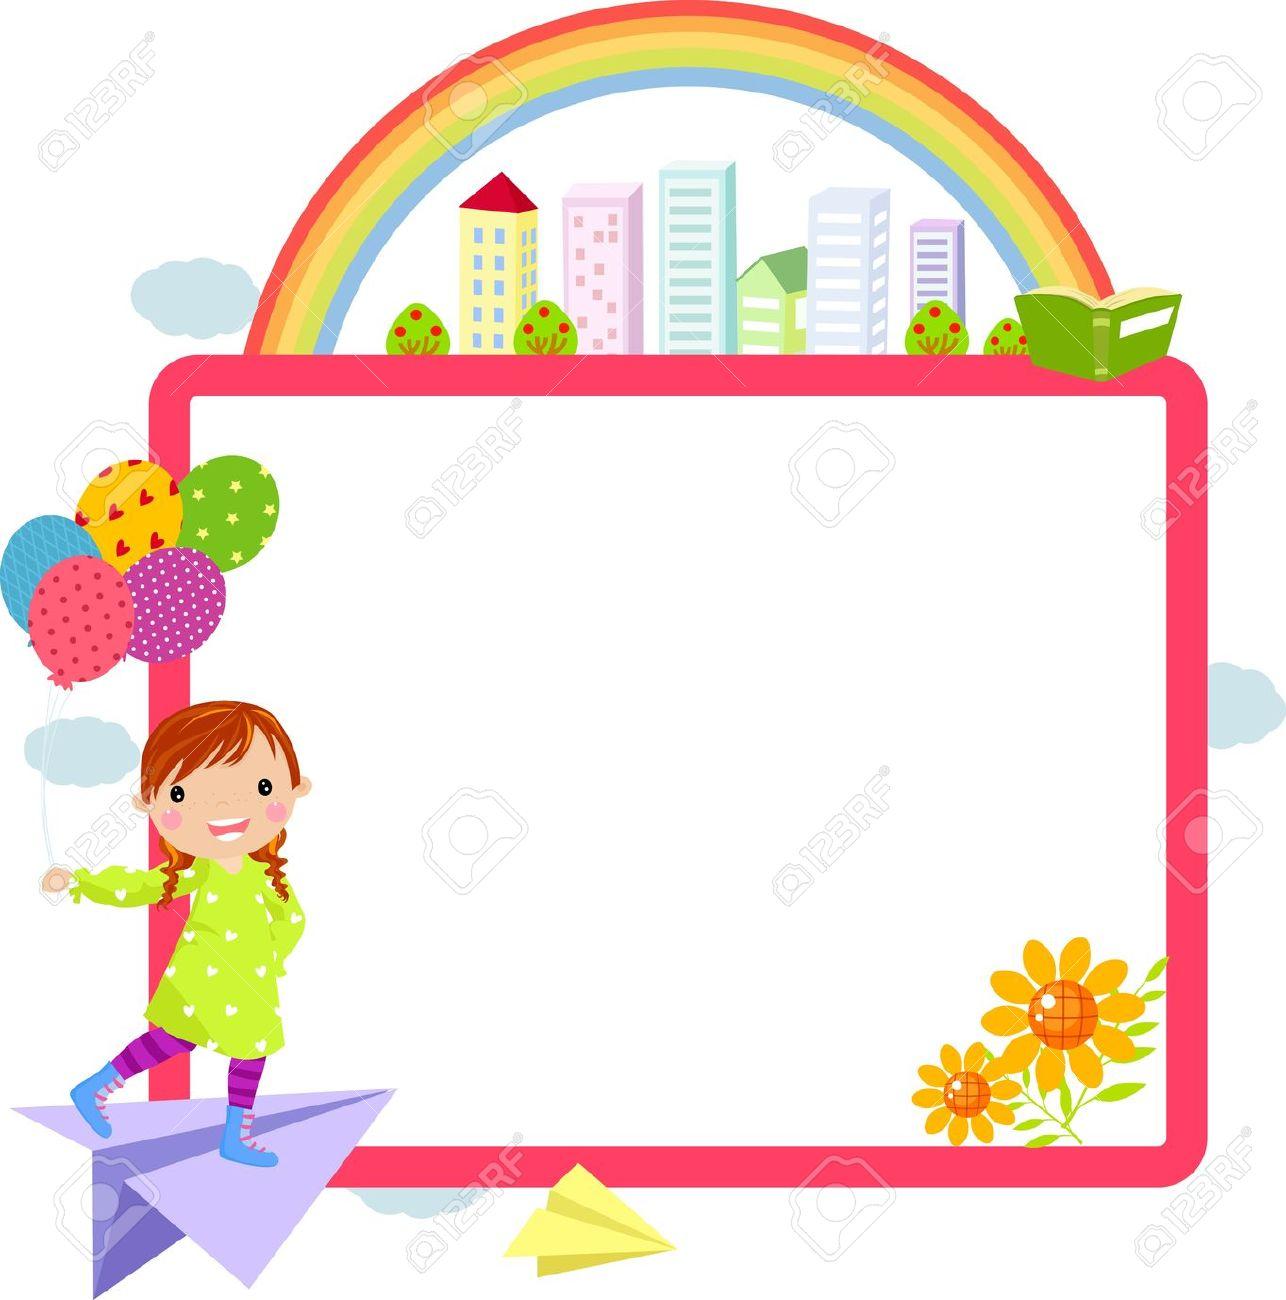 Jpeg school boarder clipart clip art royalty free stock Cute school border clipart - ClipartFest clip art royalty free stock